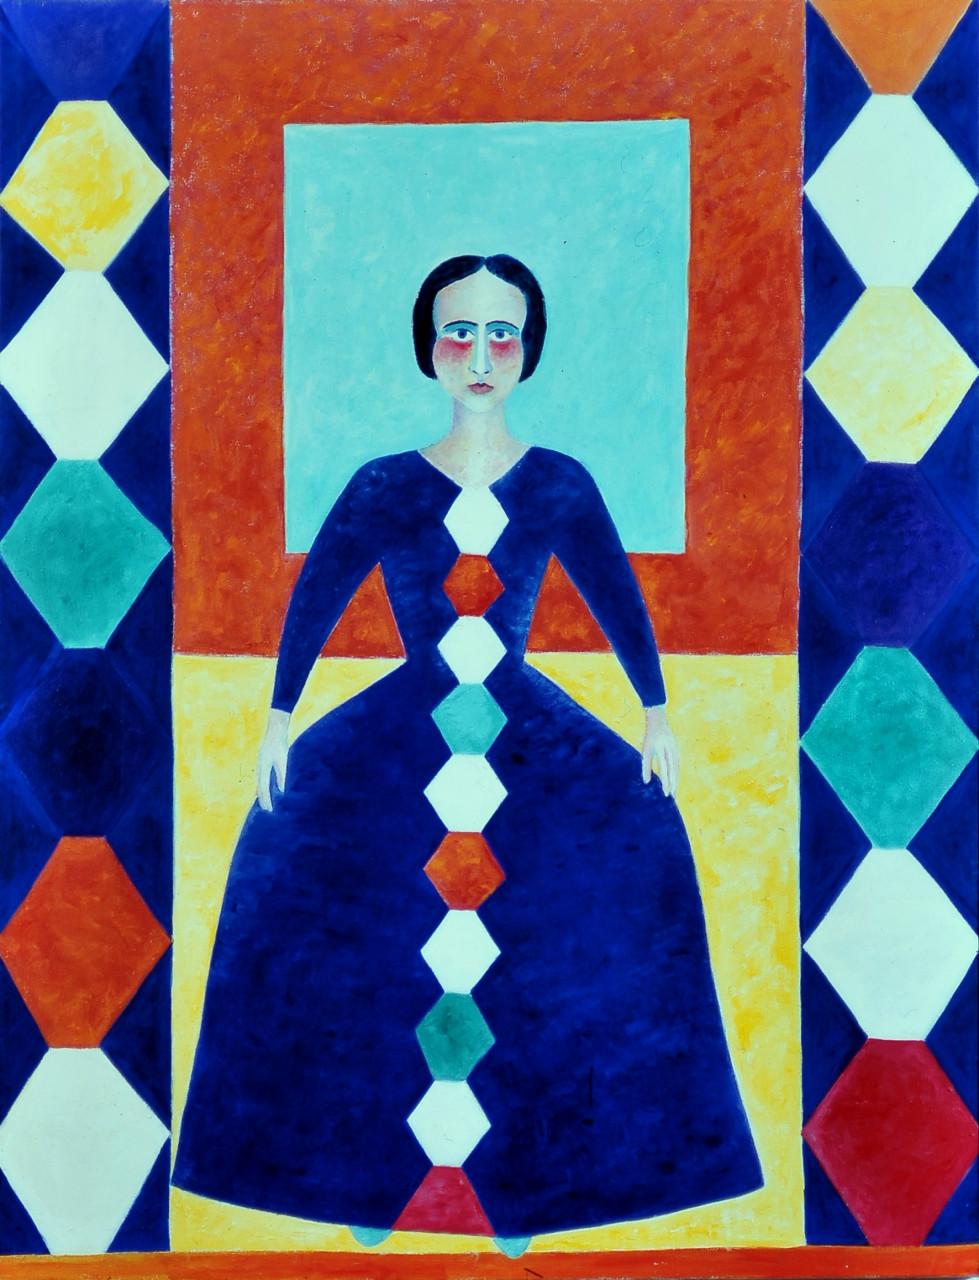 Sophia (Velasquez) 1996 Öl auf Leinwand 100x130cm